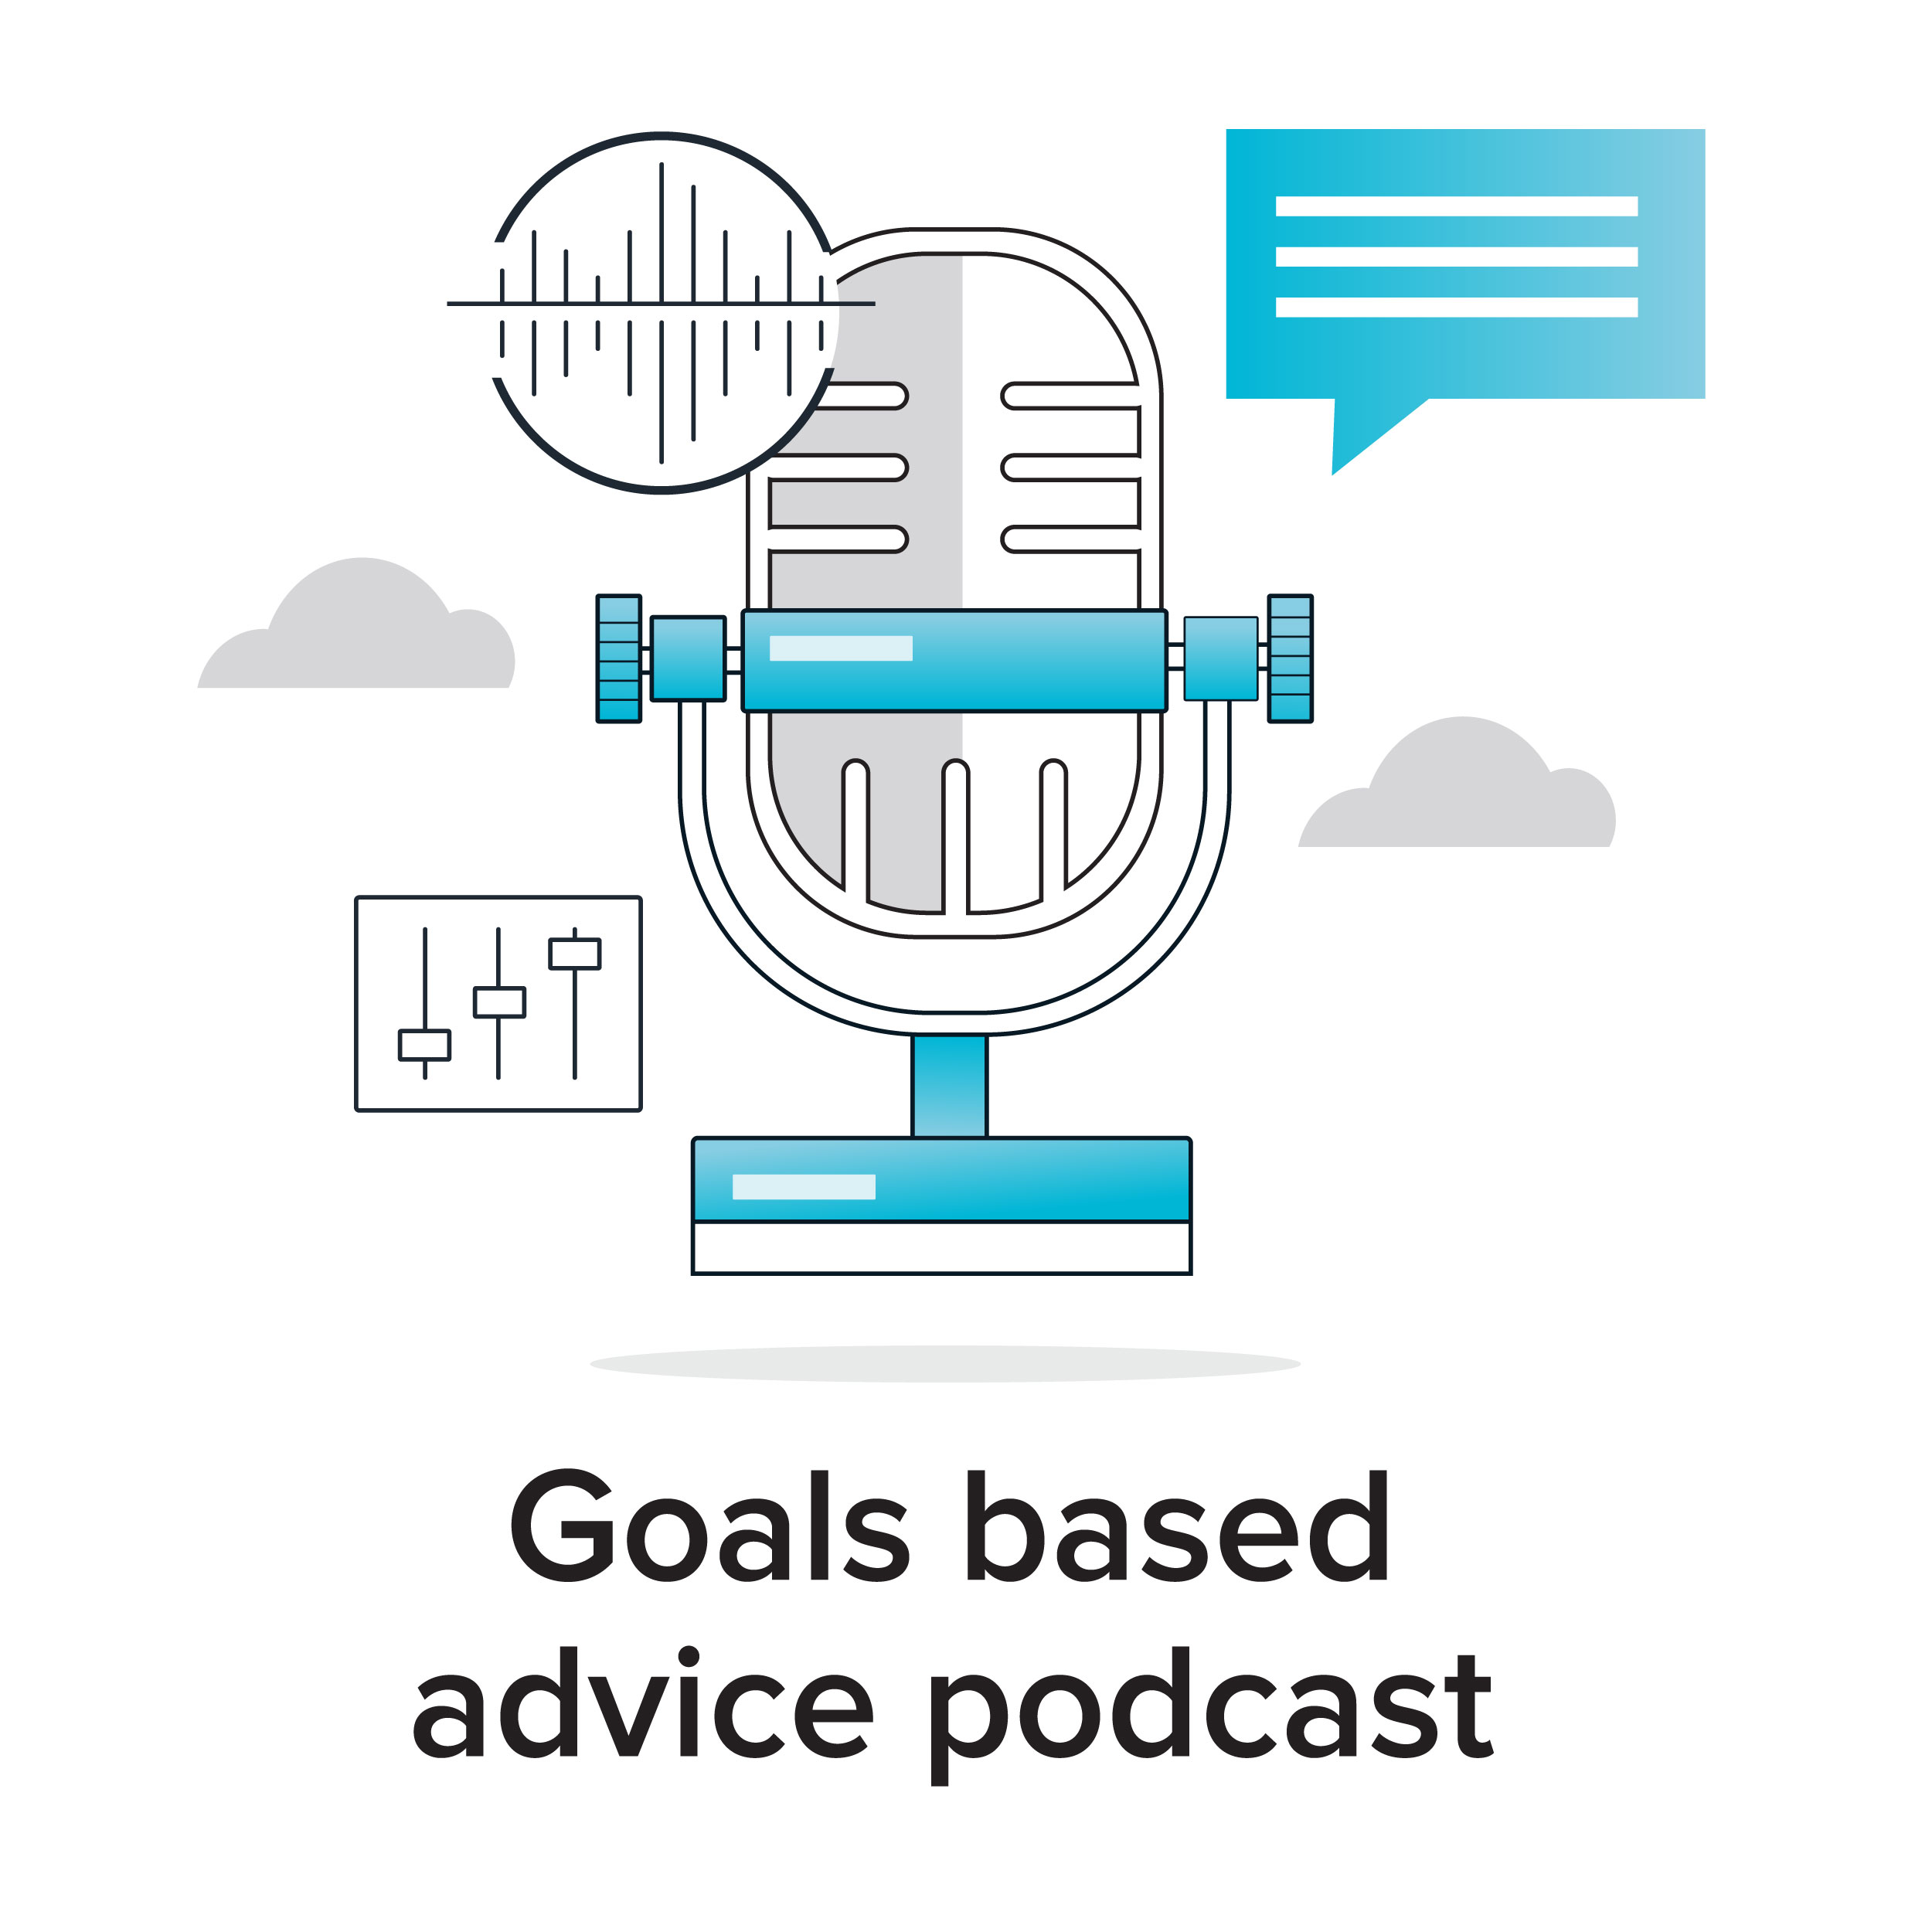 Artwork for The practical application of Goals-based advice with Finn Dorney